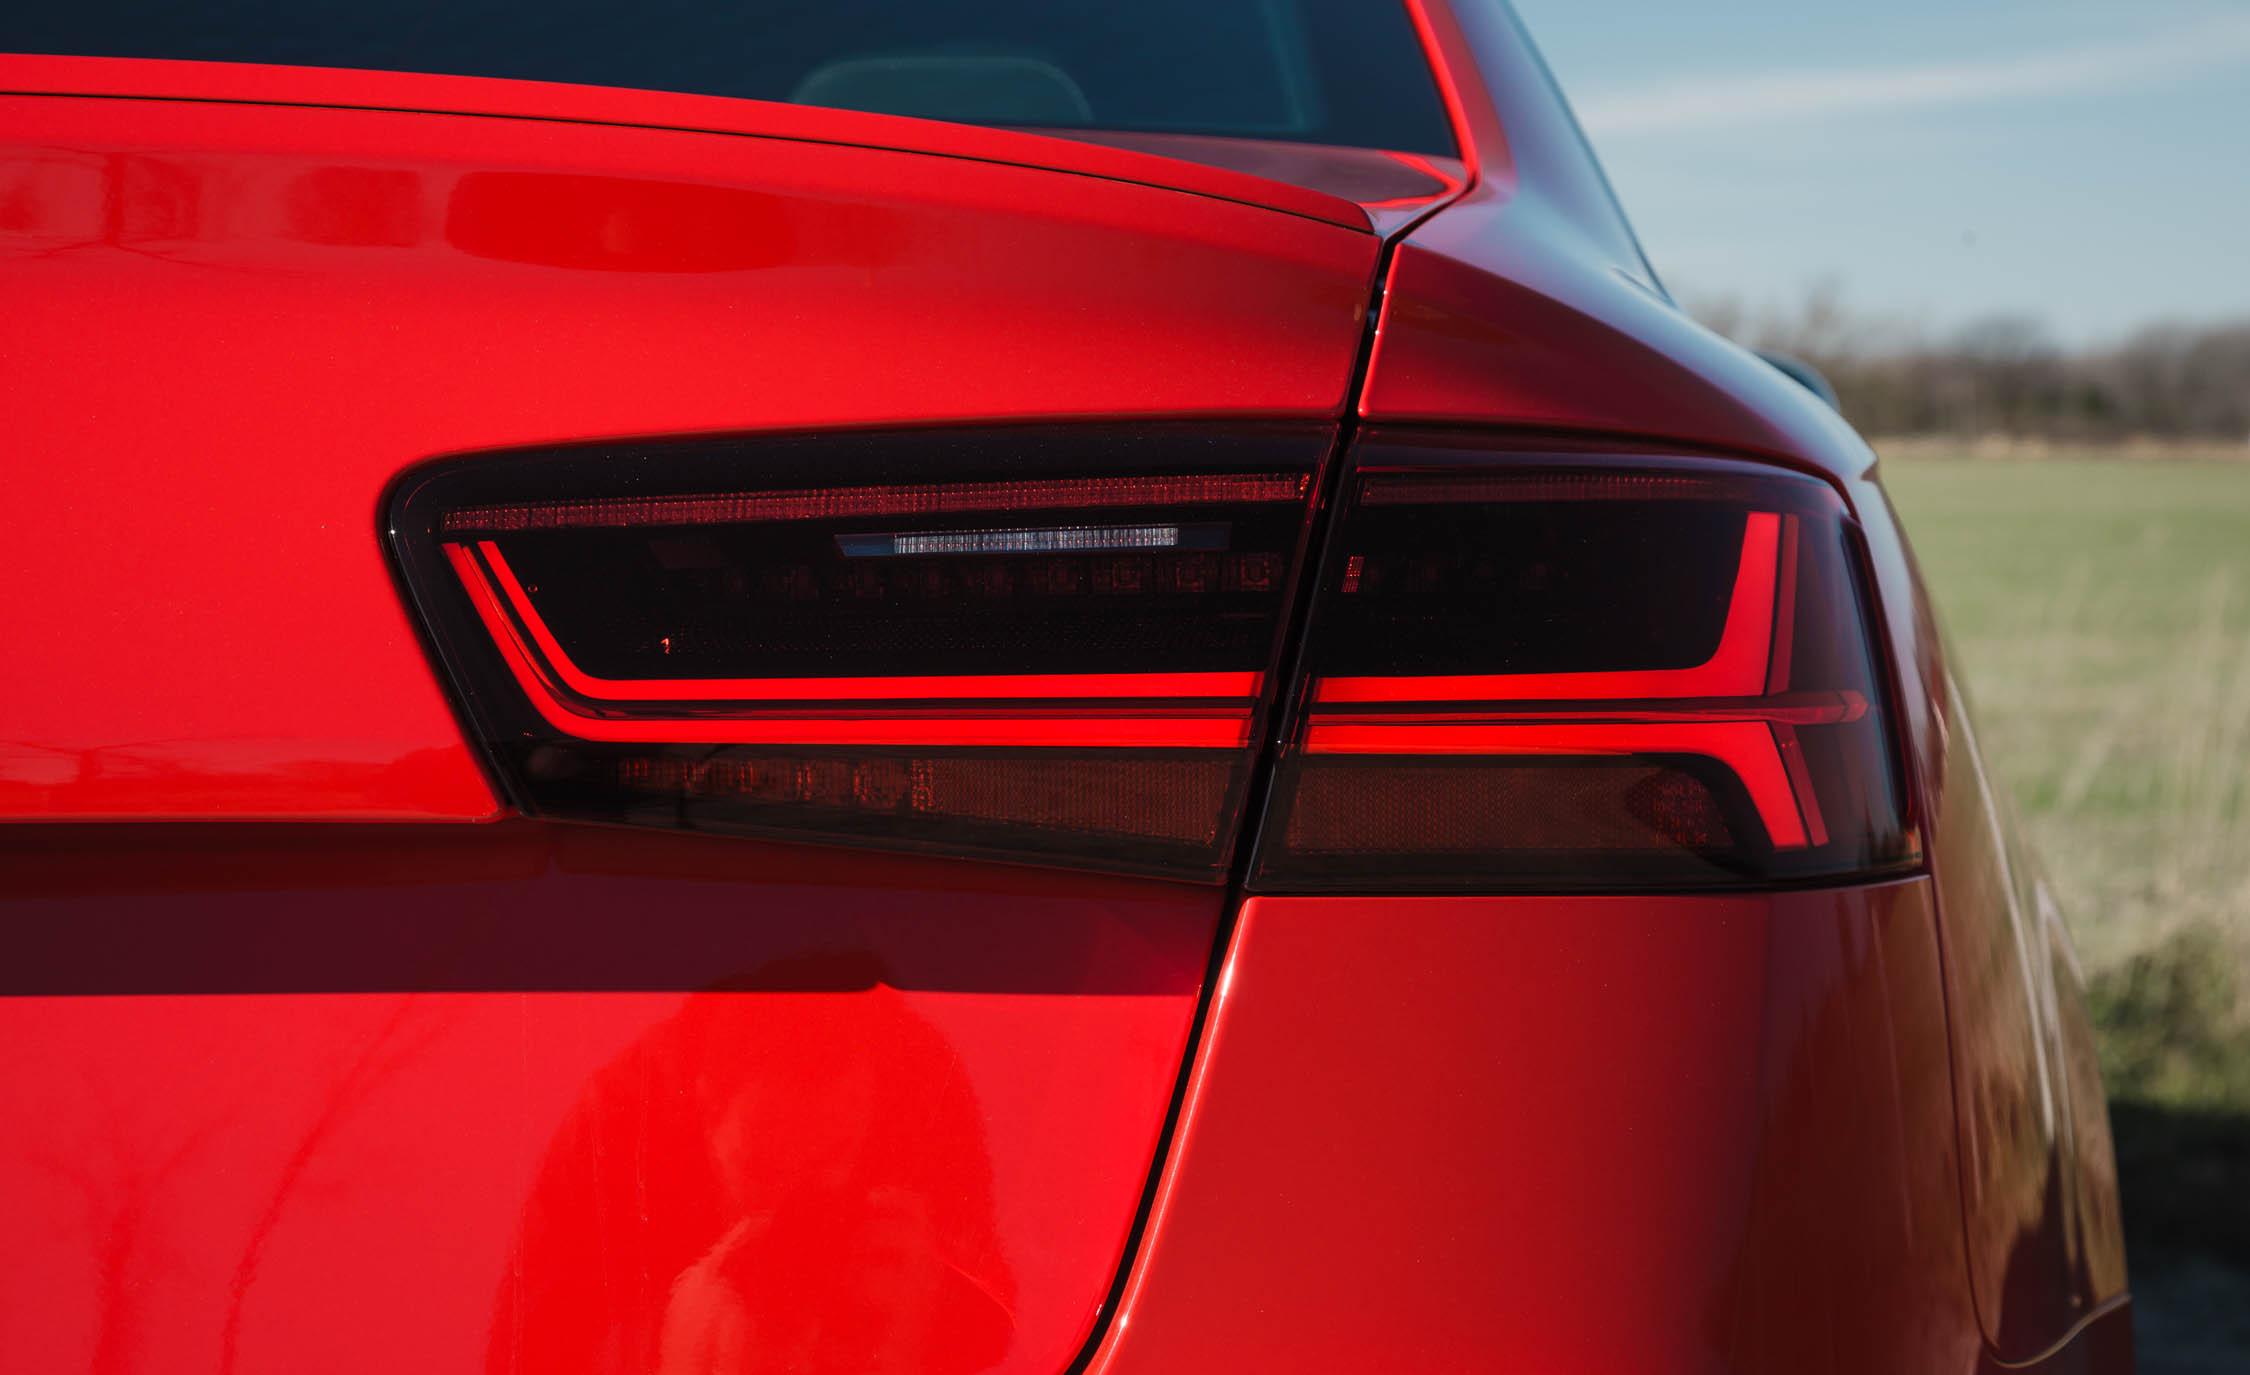 2016 Audi S6 Exterior Taillight